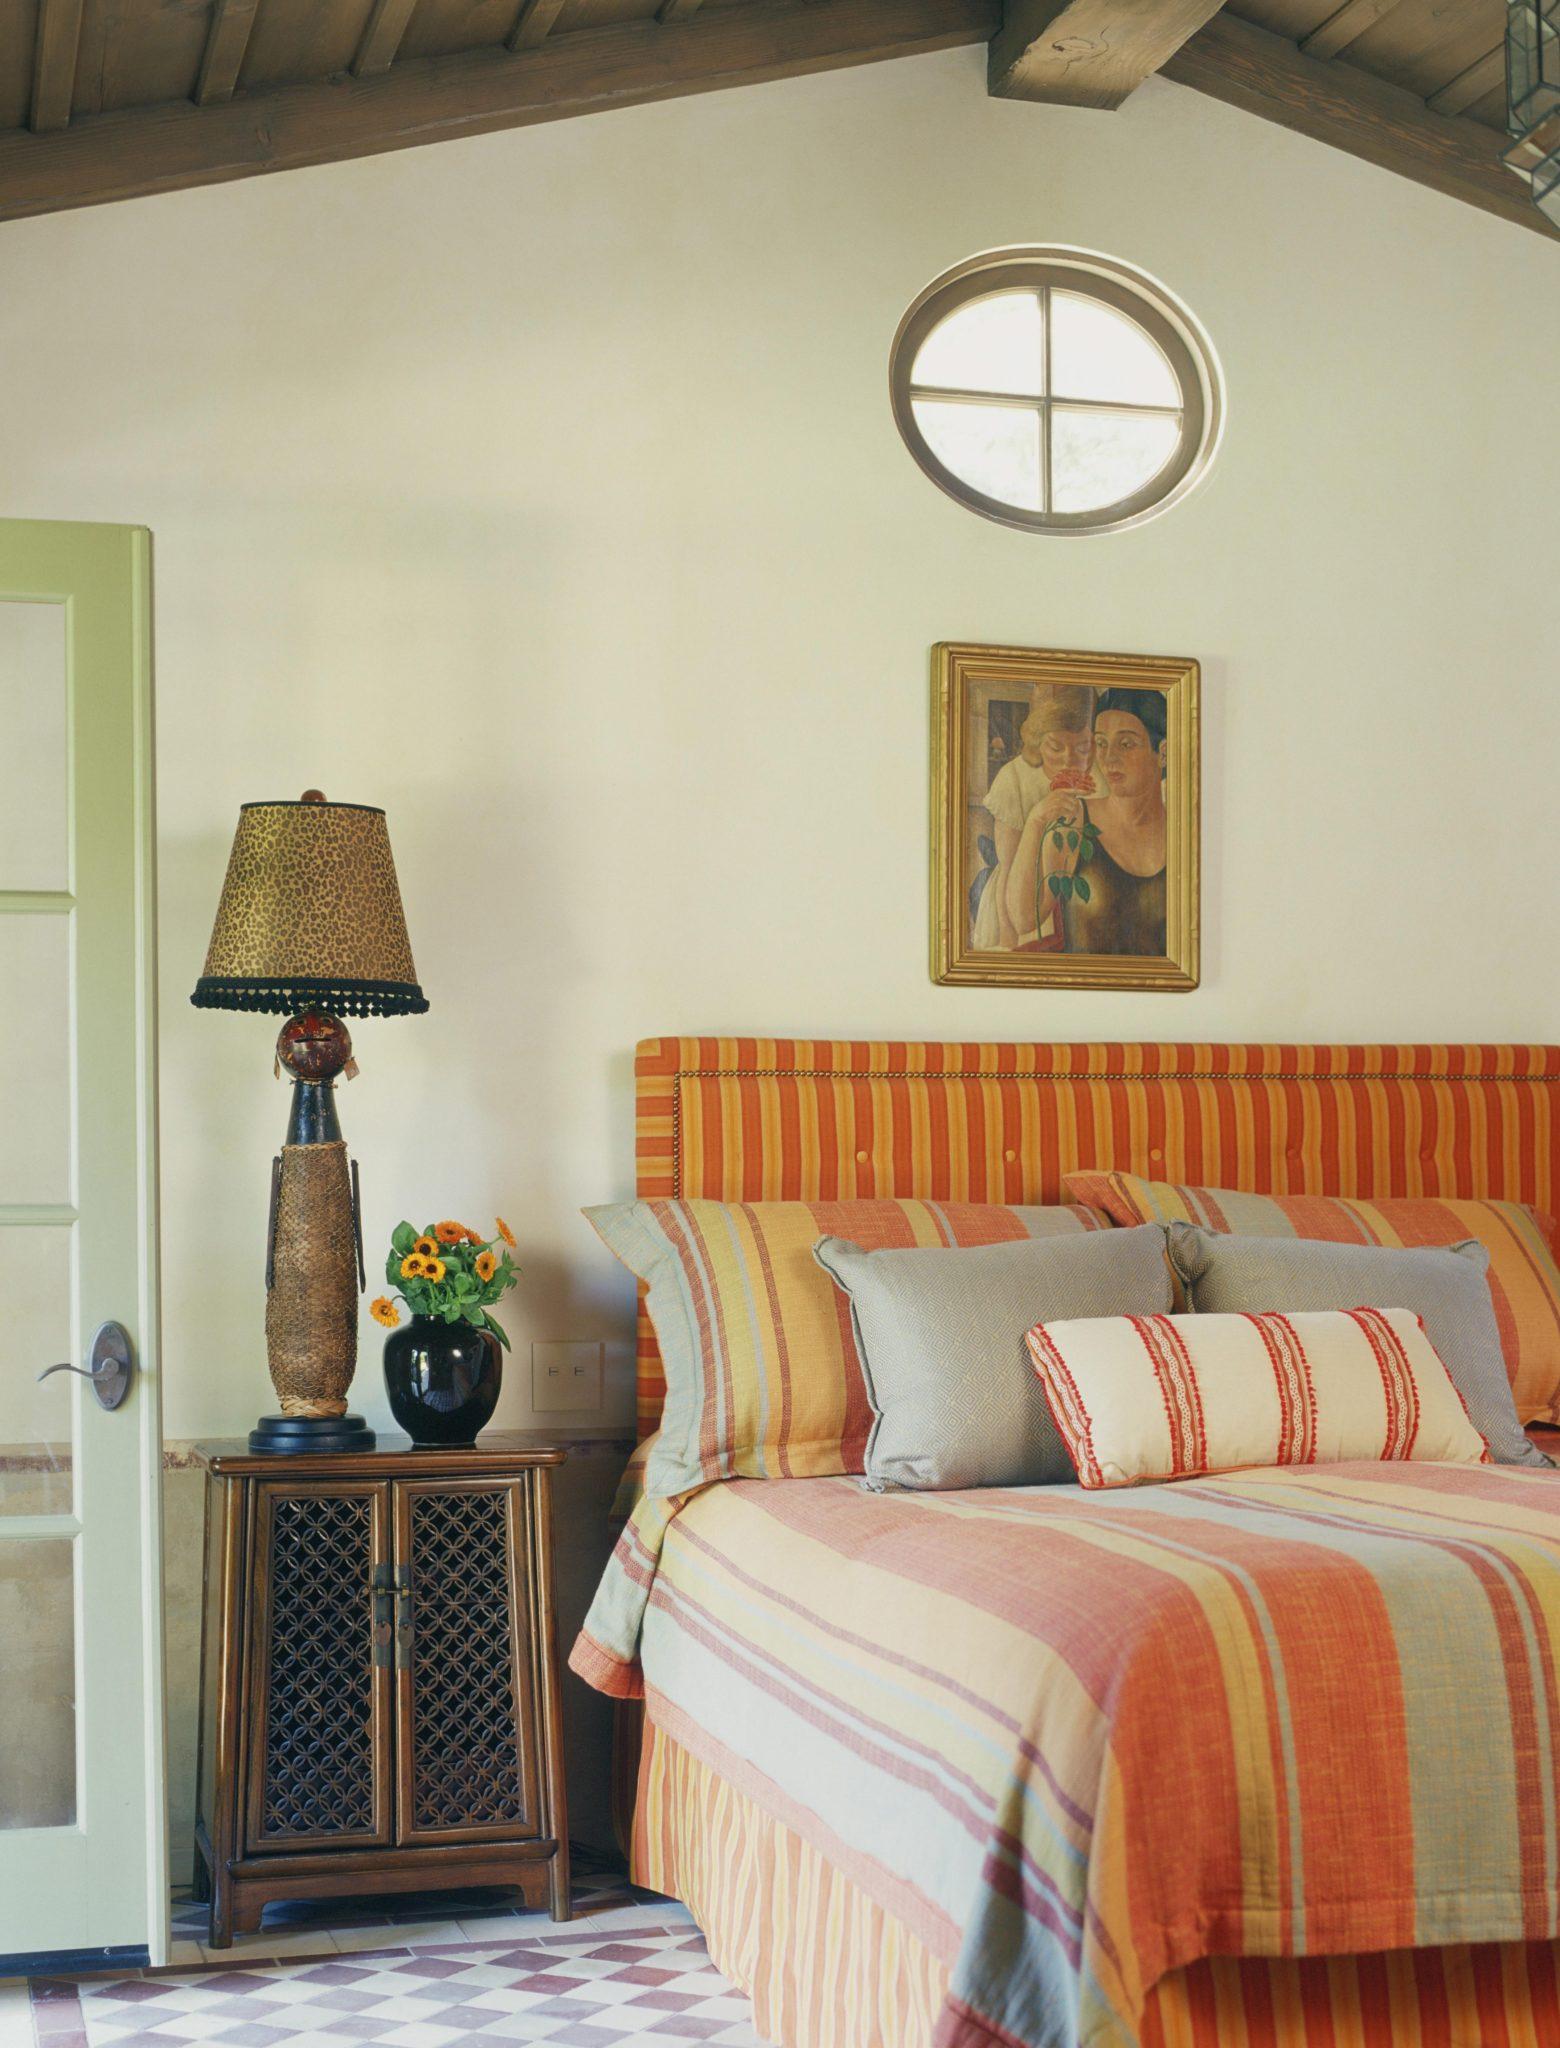 Guest house bedroom with Moroccan flavor designedby Thomas Callaway Associates, Inc.